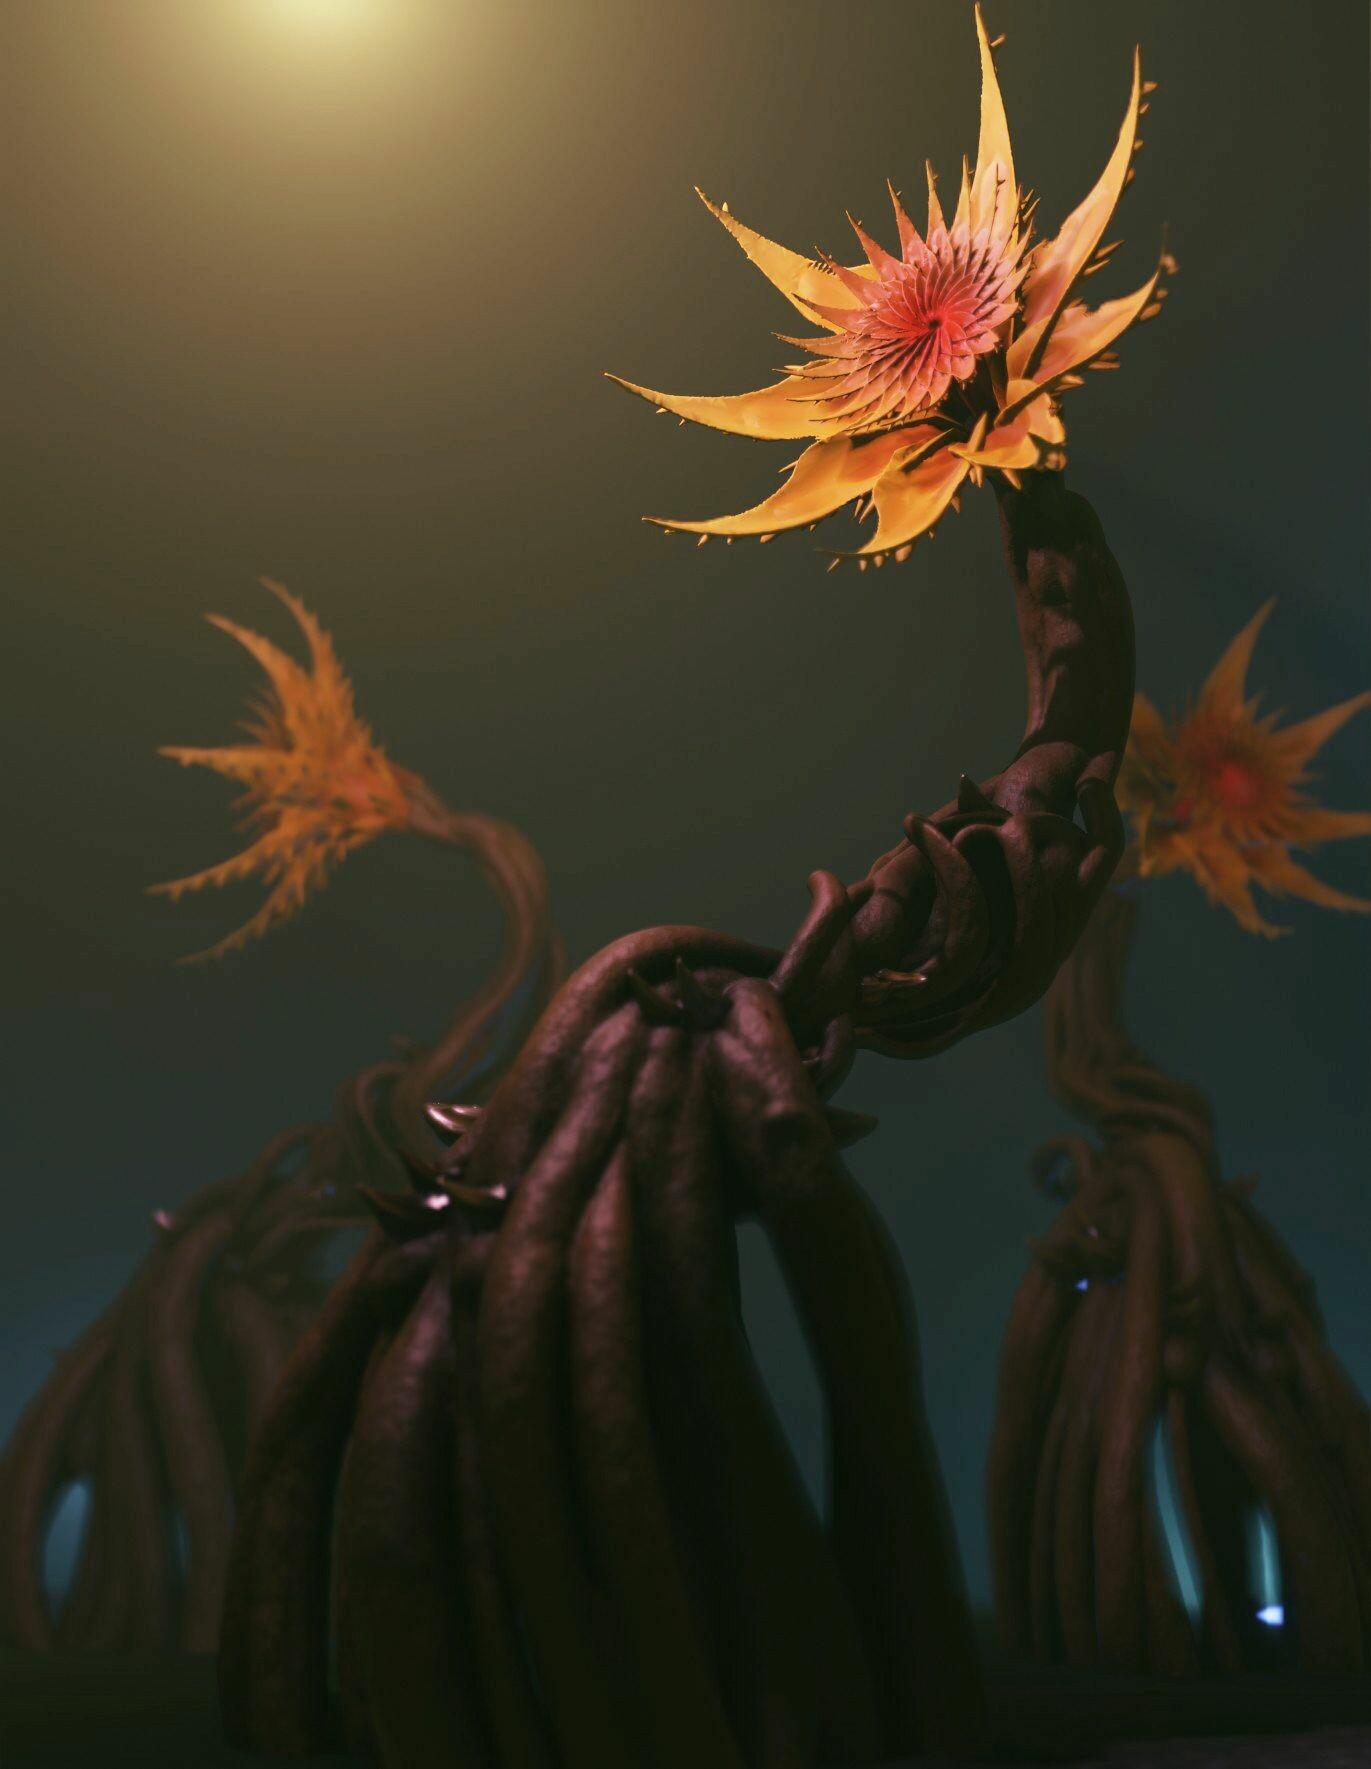 Stijn windig plants